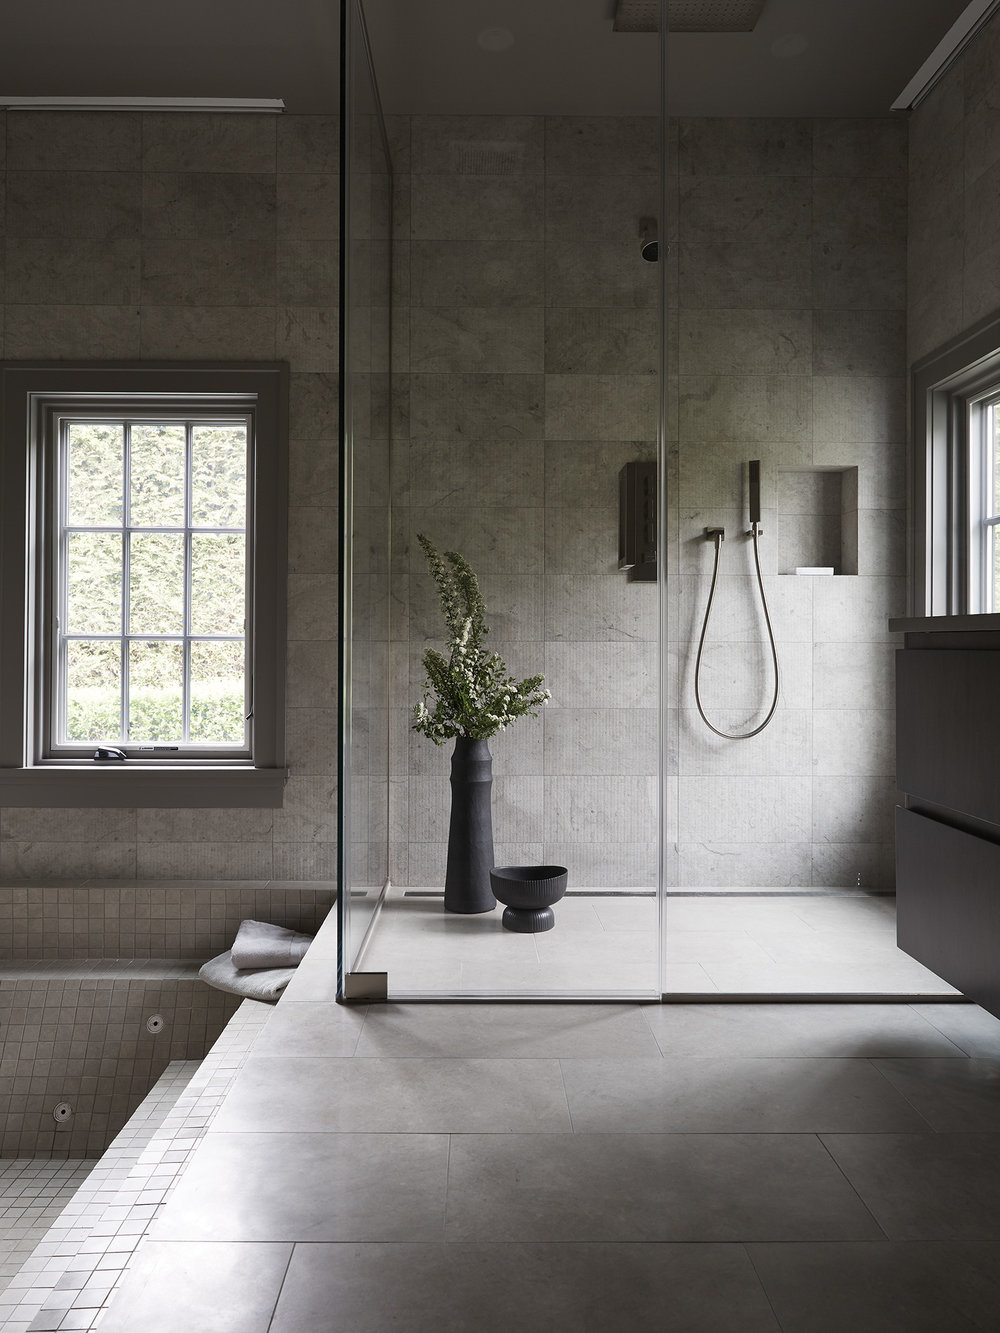 Sonny_Bathroom_016.jpg